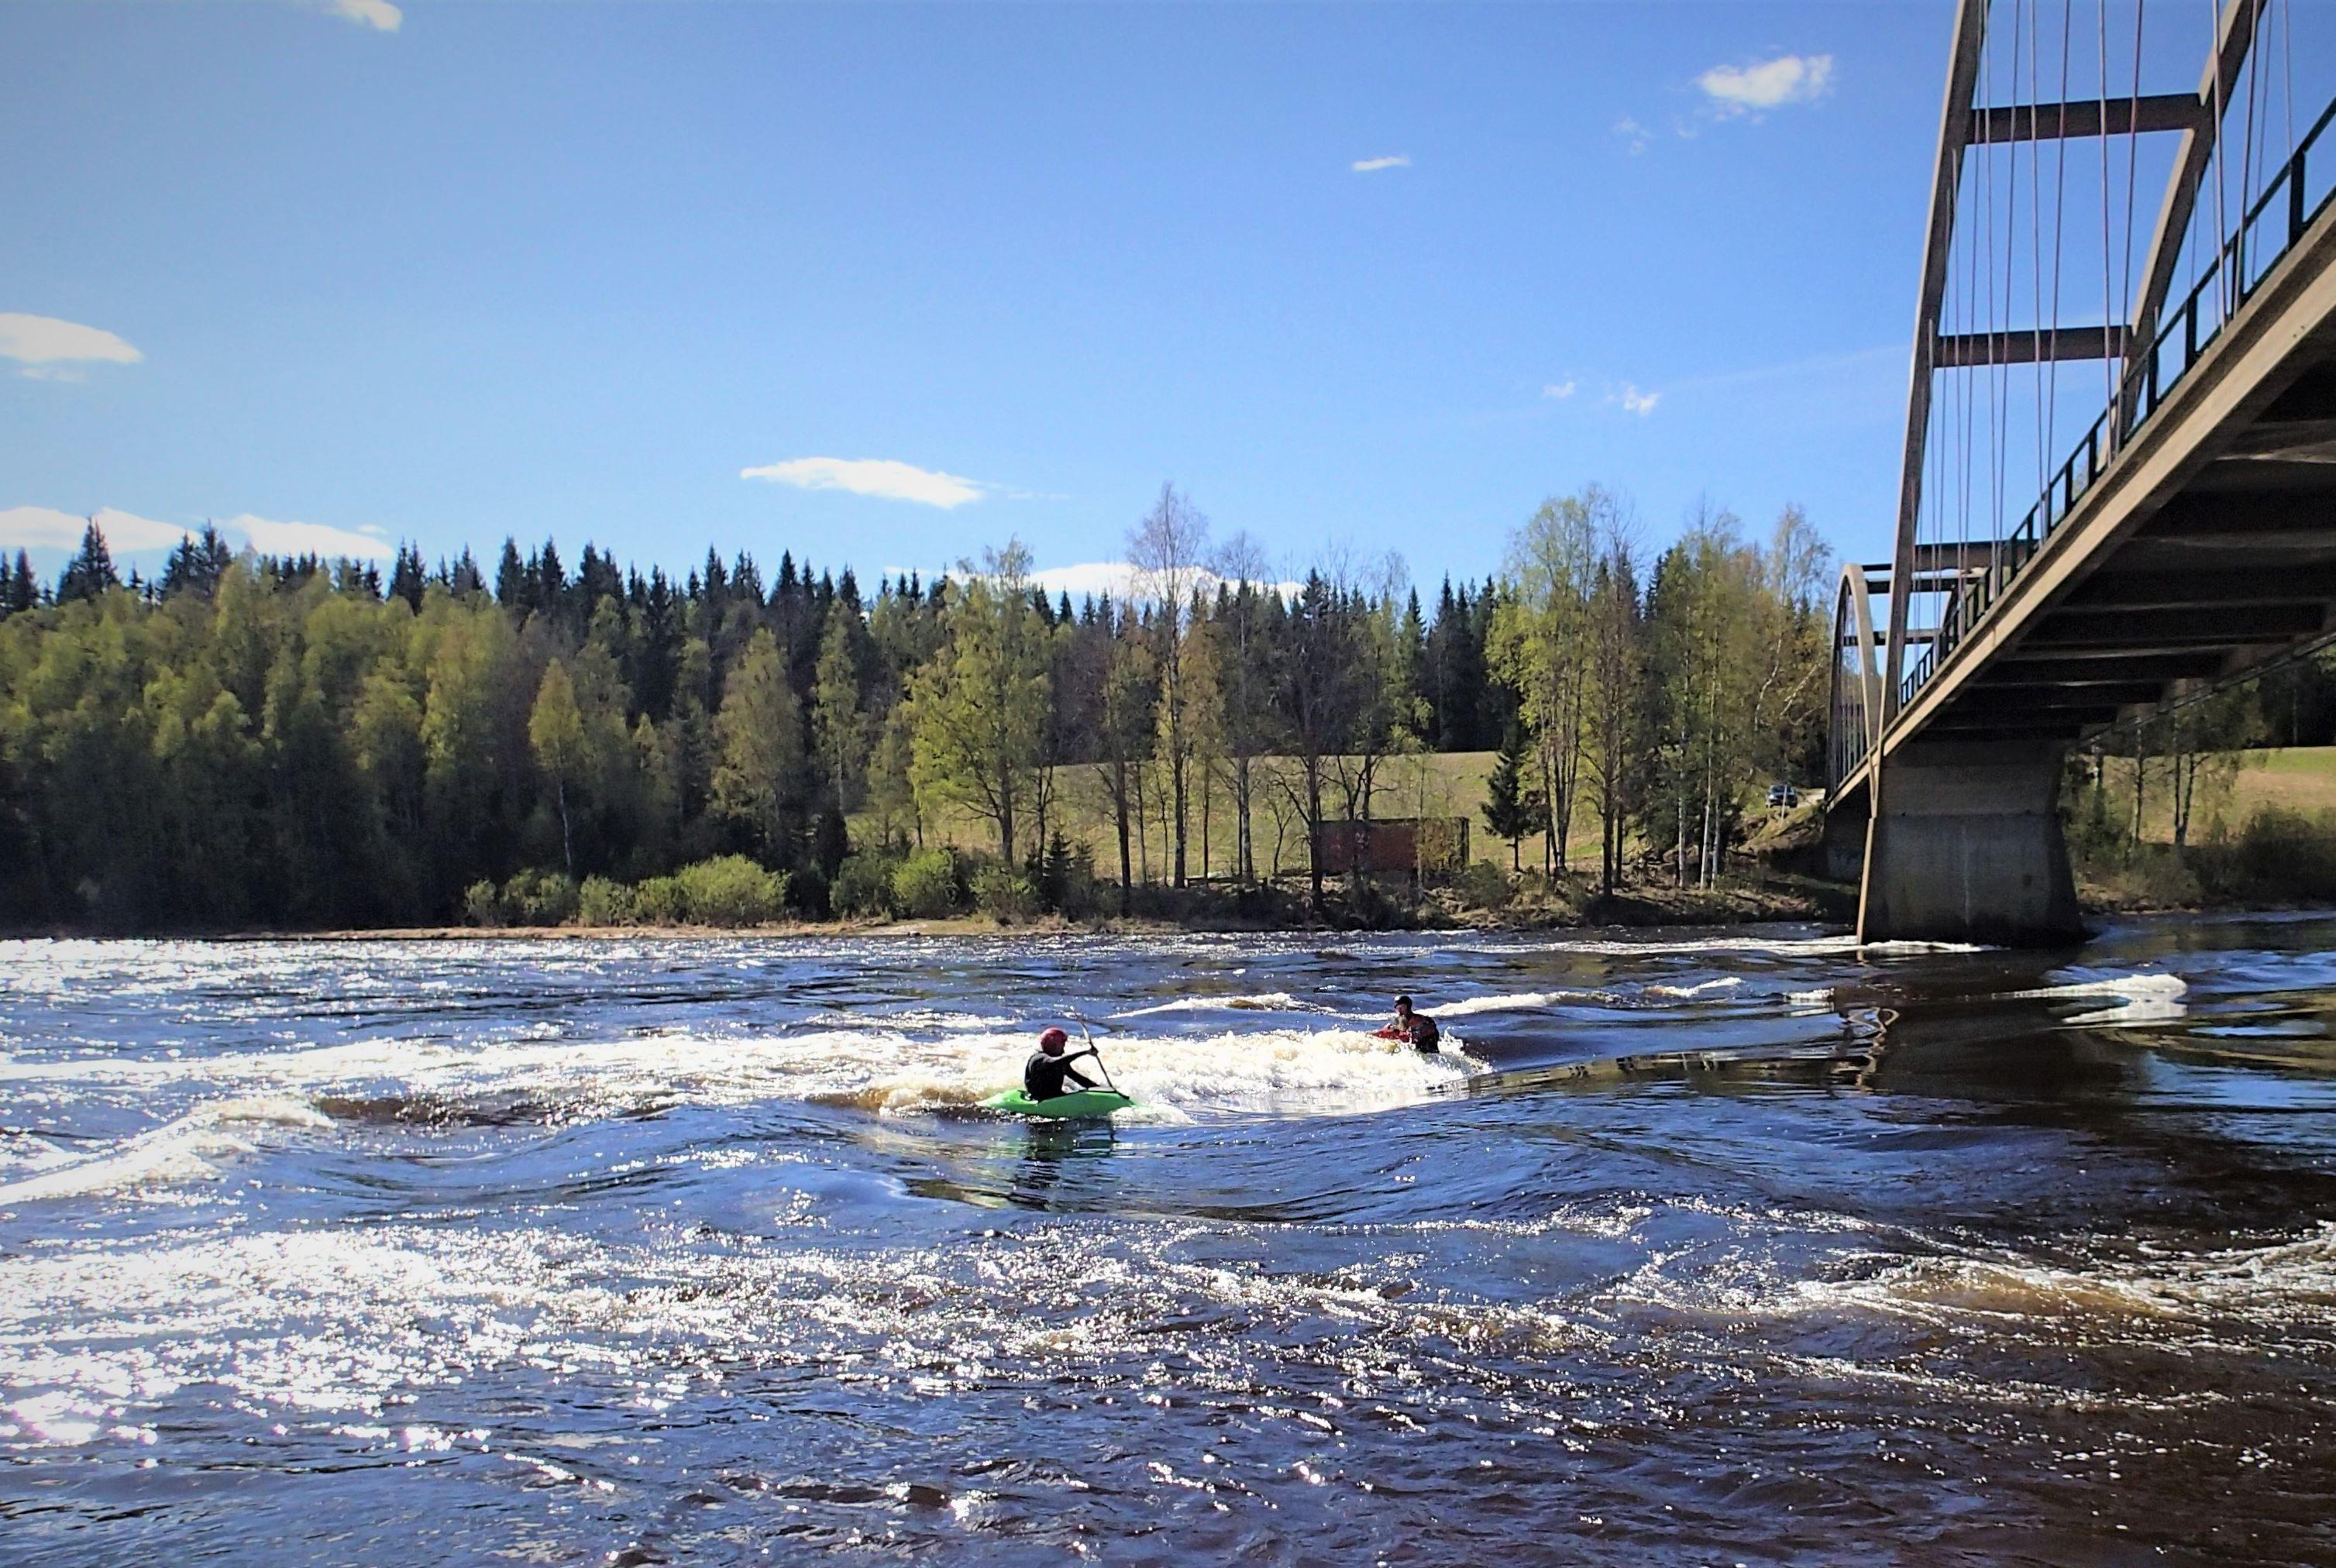 Whitewater kayaking for beginners